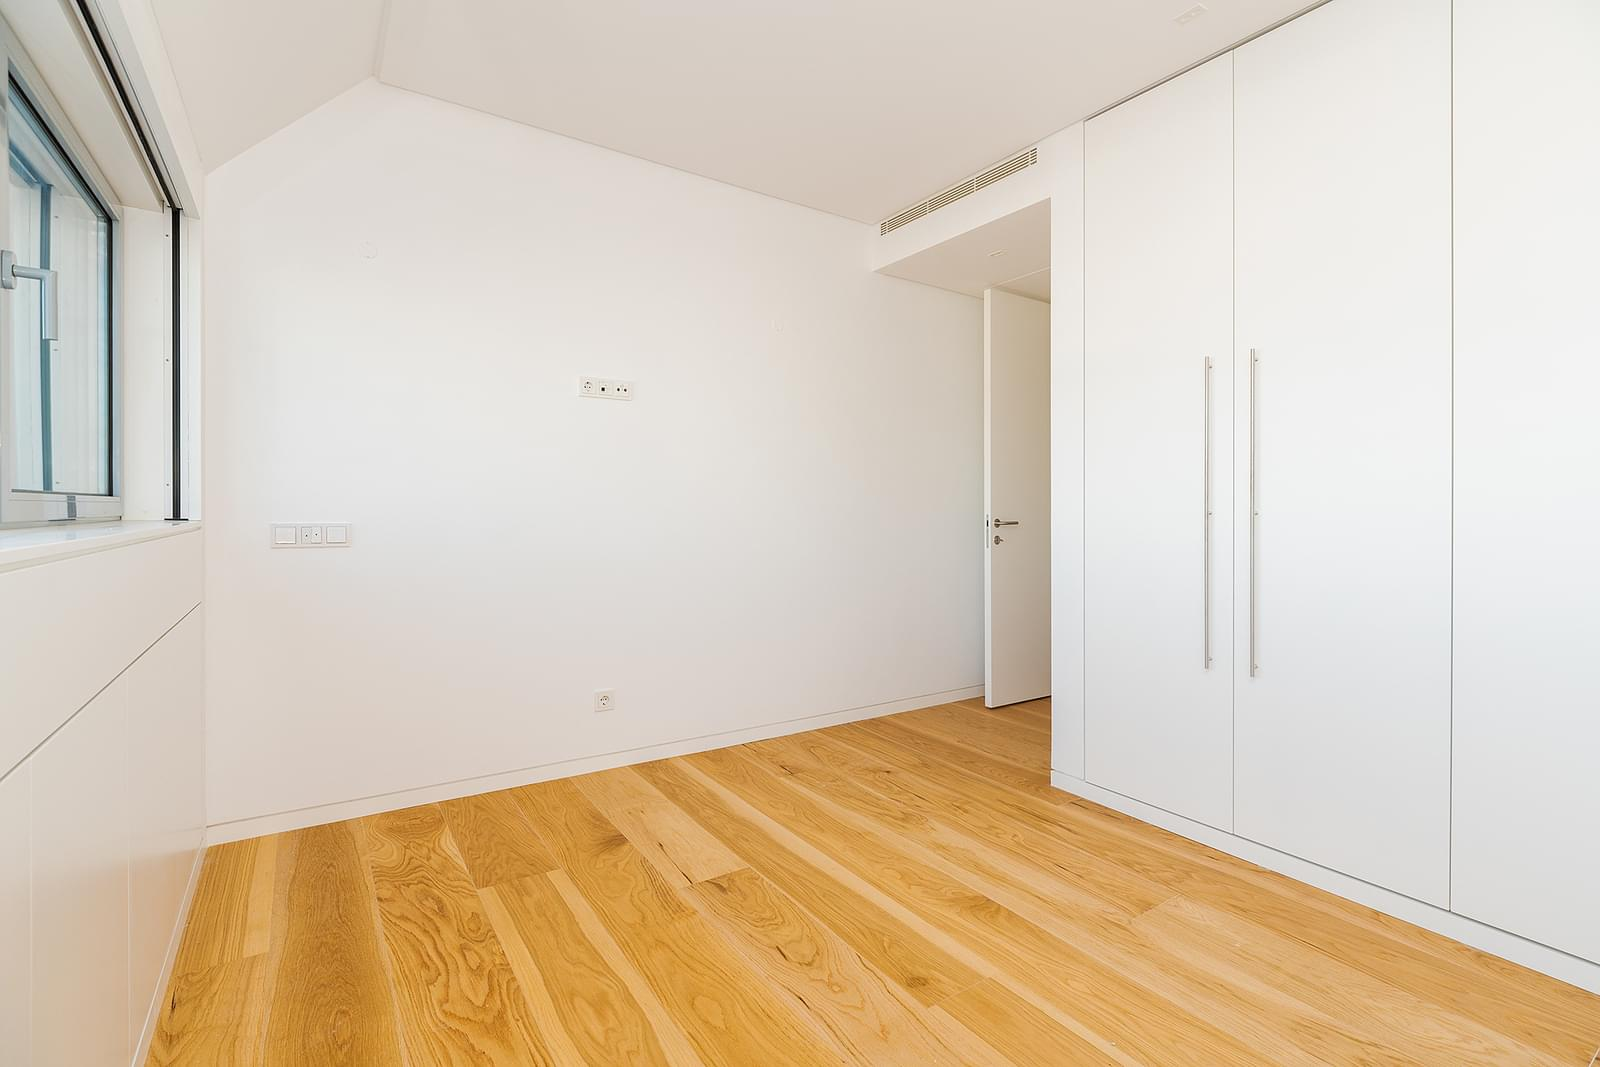 pf18713-apartamento-t3-lisboa-02bffcd0-0ad7-4489-b00b-f1e192482cdf